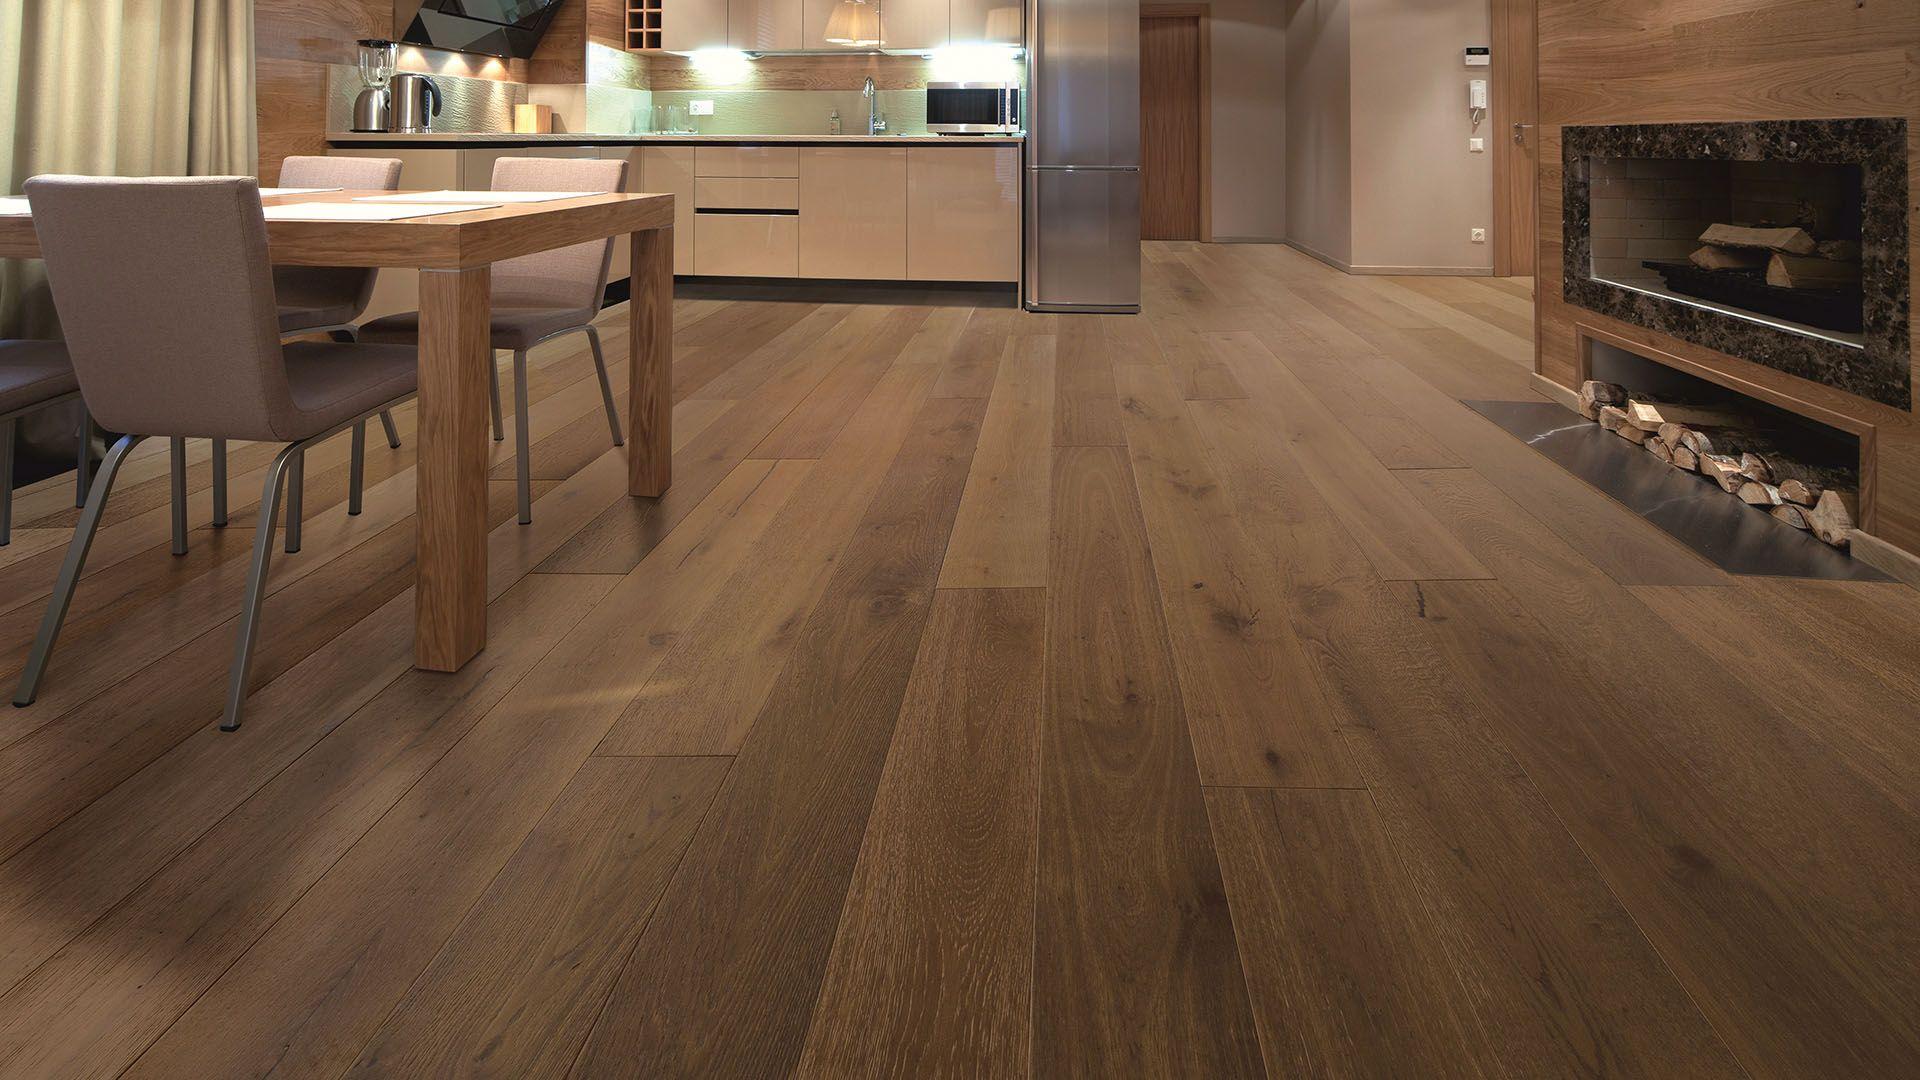 Pin By Gizella Boochin On Flooring Hardwood Flooring Beautiful Wood Inspiration